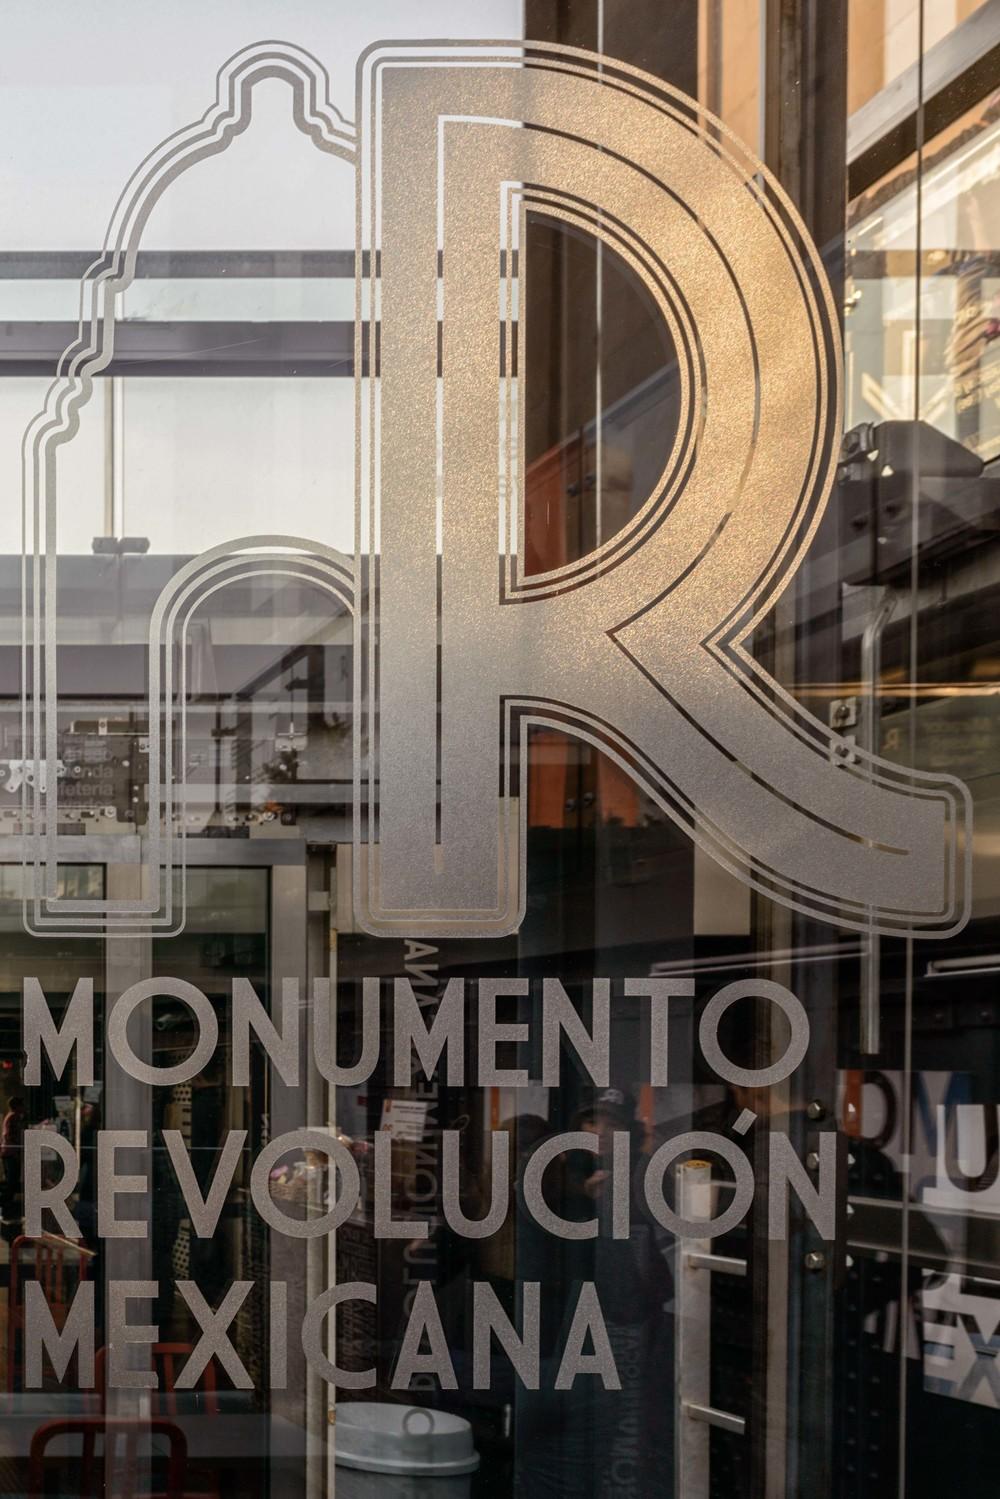 Monumento Revolucion Mexicana - 022.jpg